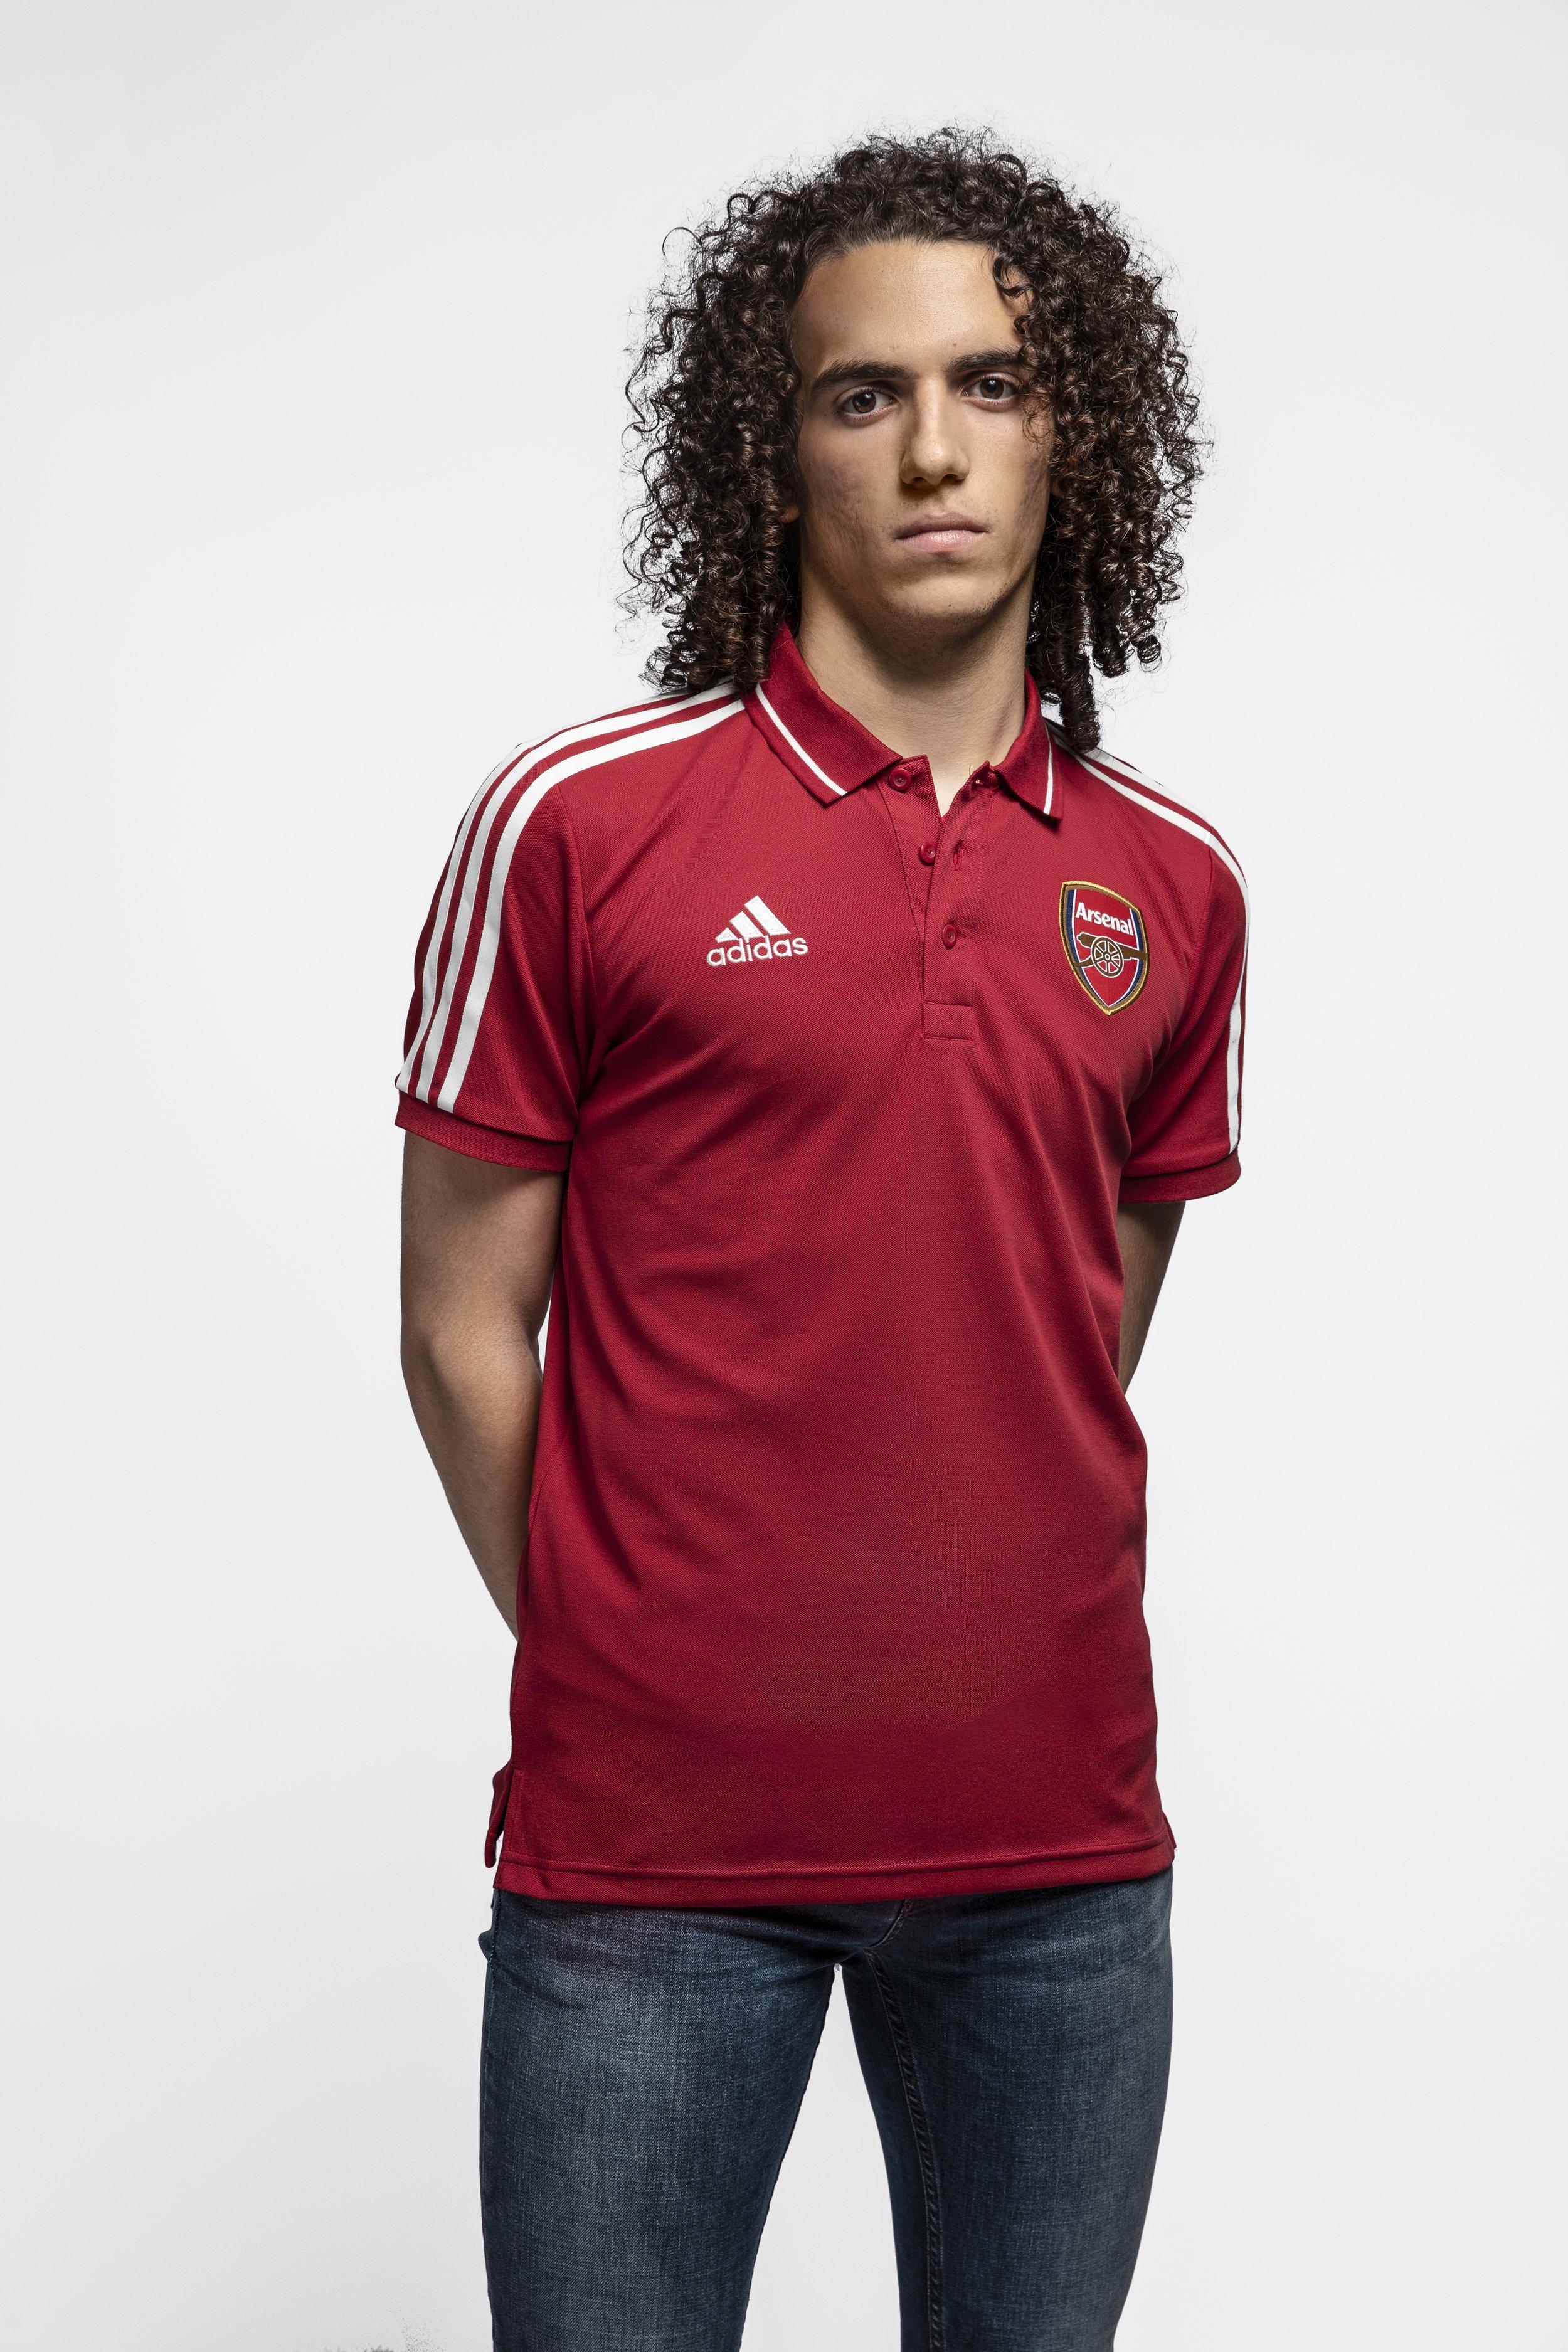 Arsenal Adidas Edited Gendouzi-2.jpg